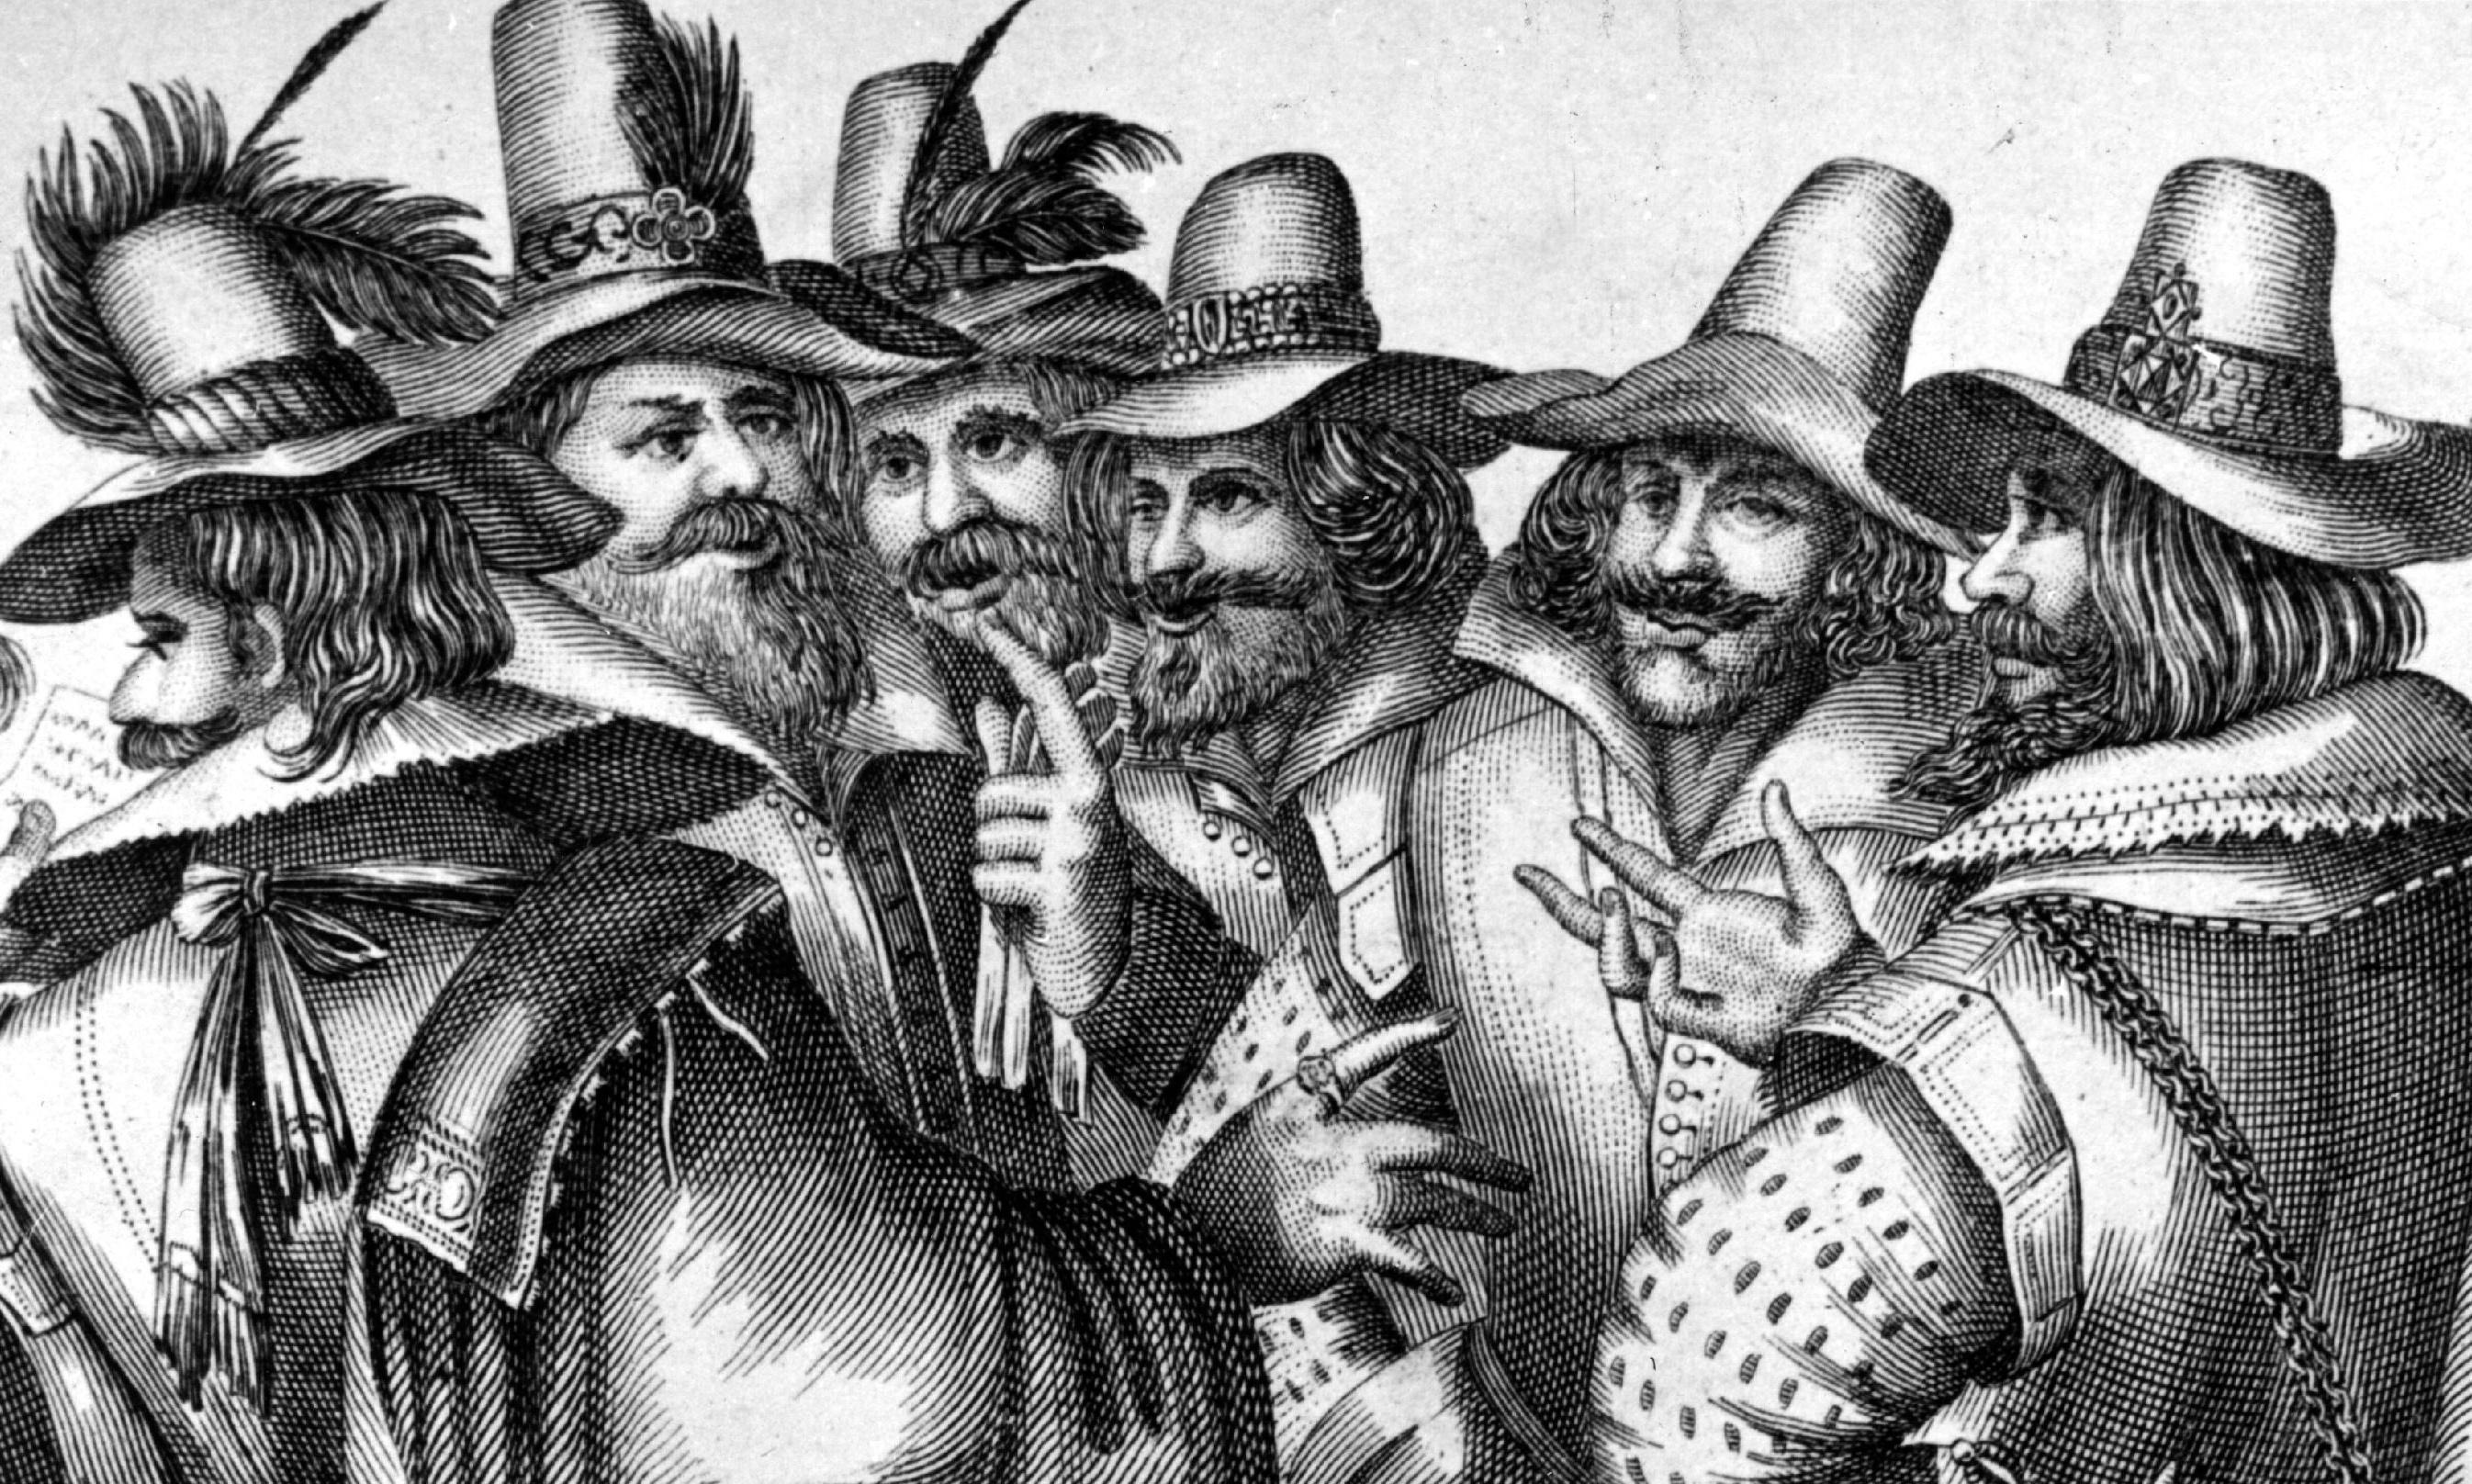 Can you solve it? Gunpowder, reason and plot